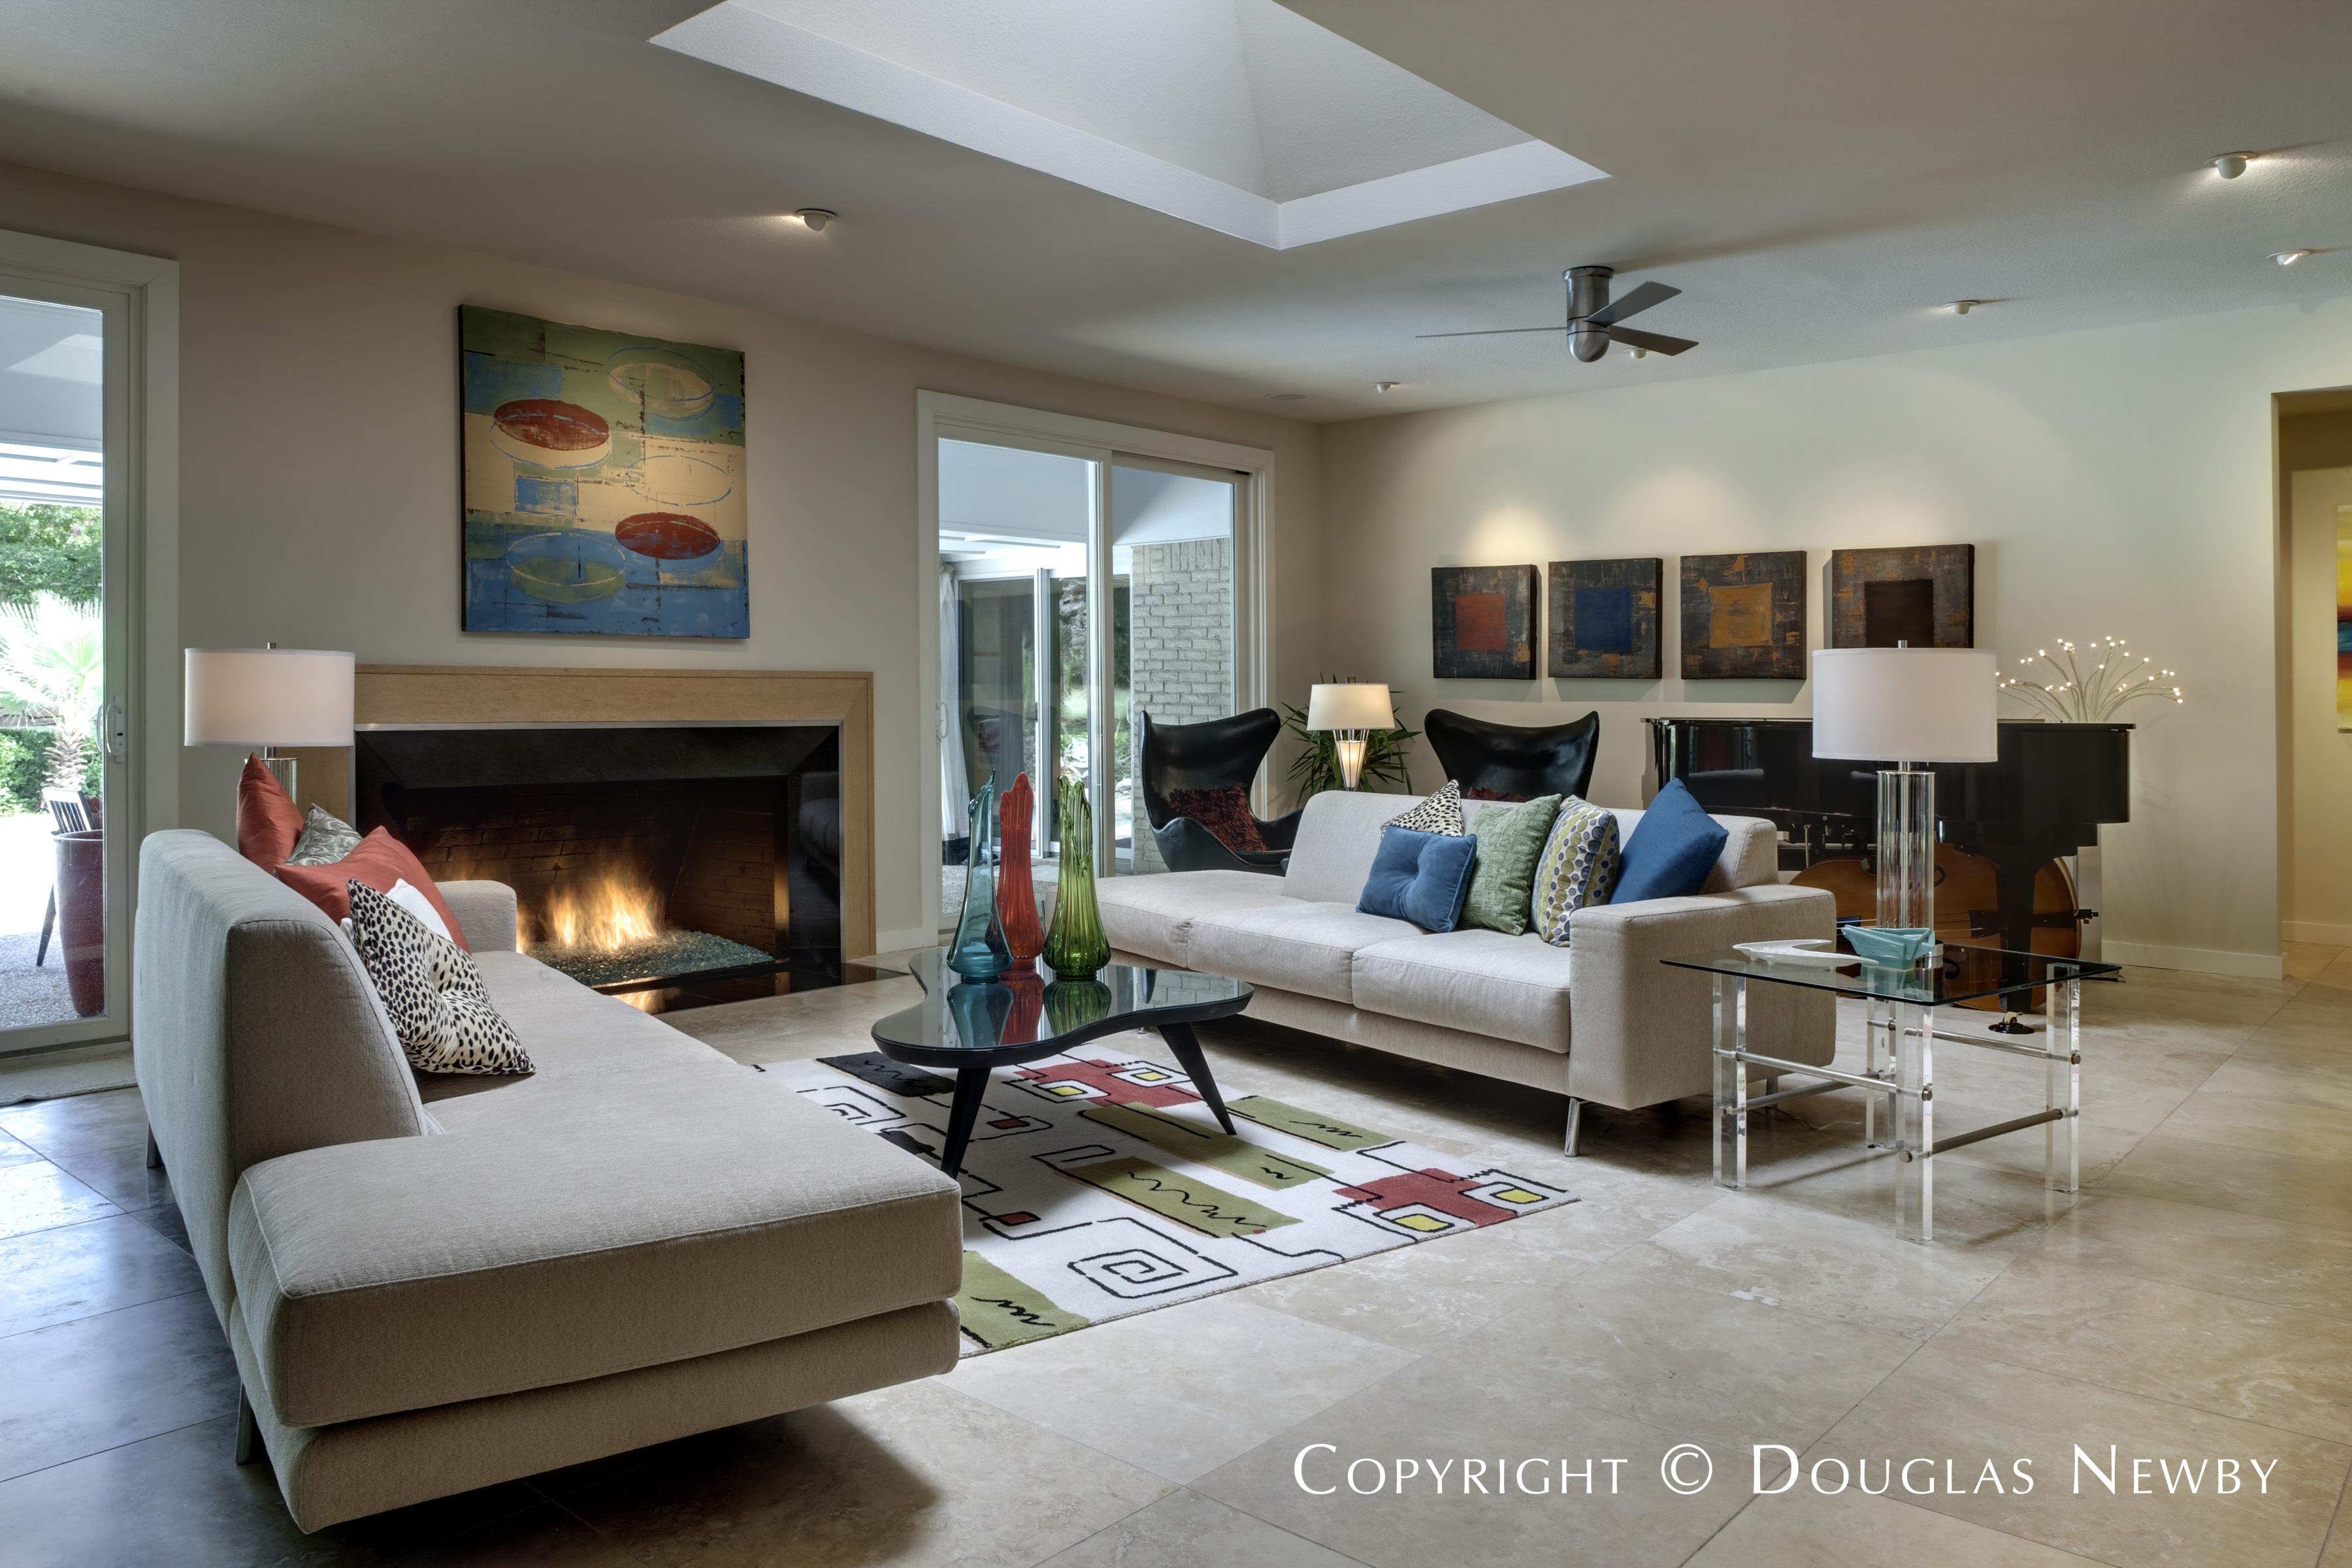 Northwood Hills Mid-Century Modern Home